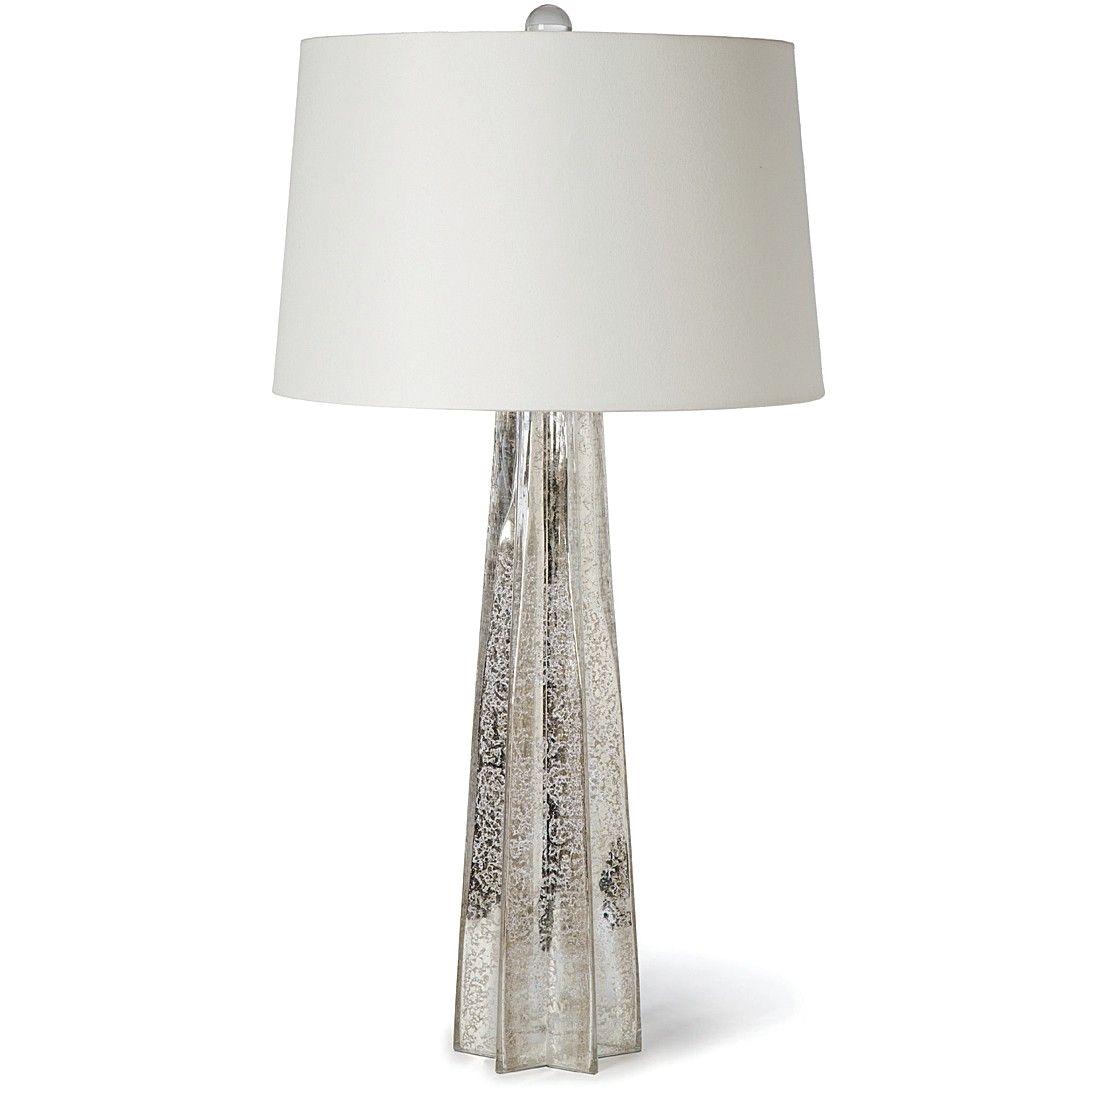 regina andrew antique mercury glass star lamp brand regina andrew product id 4067 dimensions 16l x 16w x 31h wattage 1 bulb a 150w 3 way material